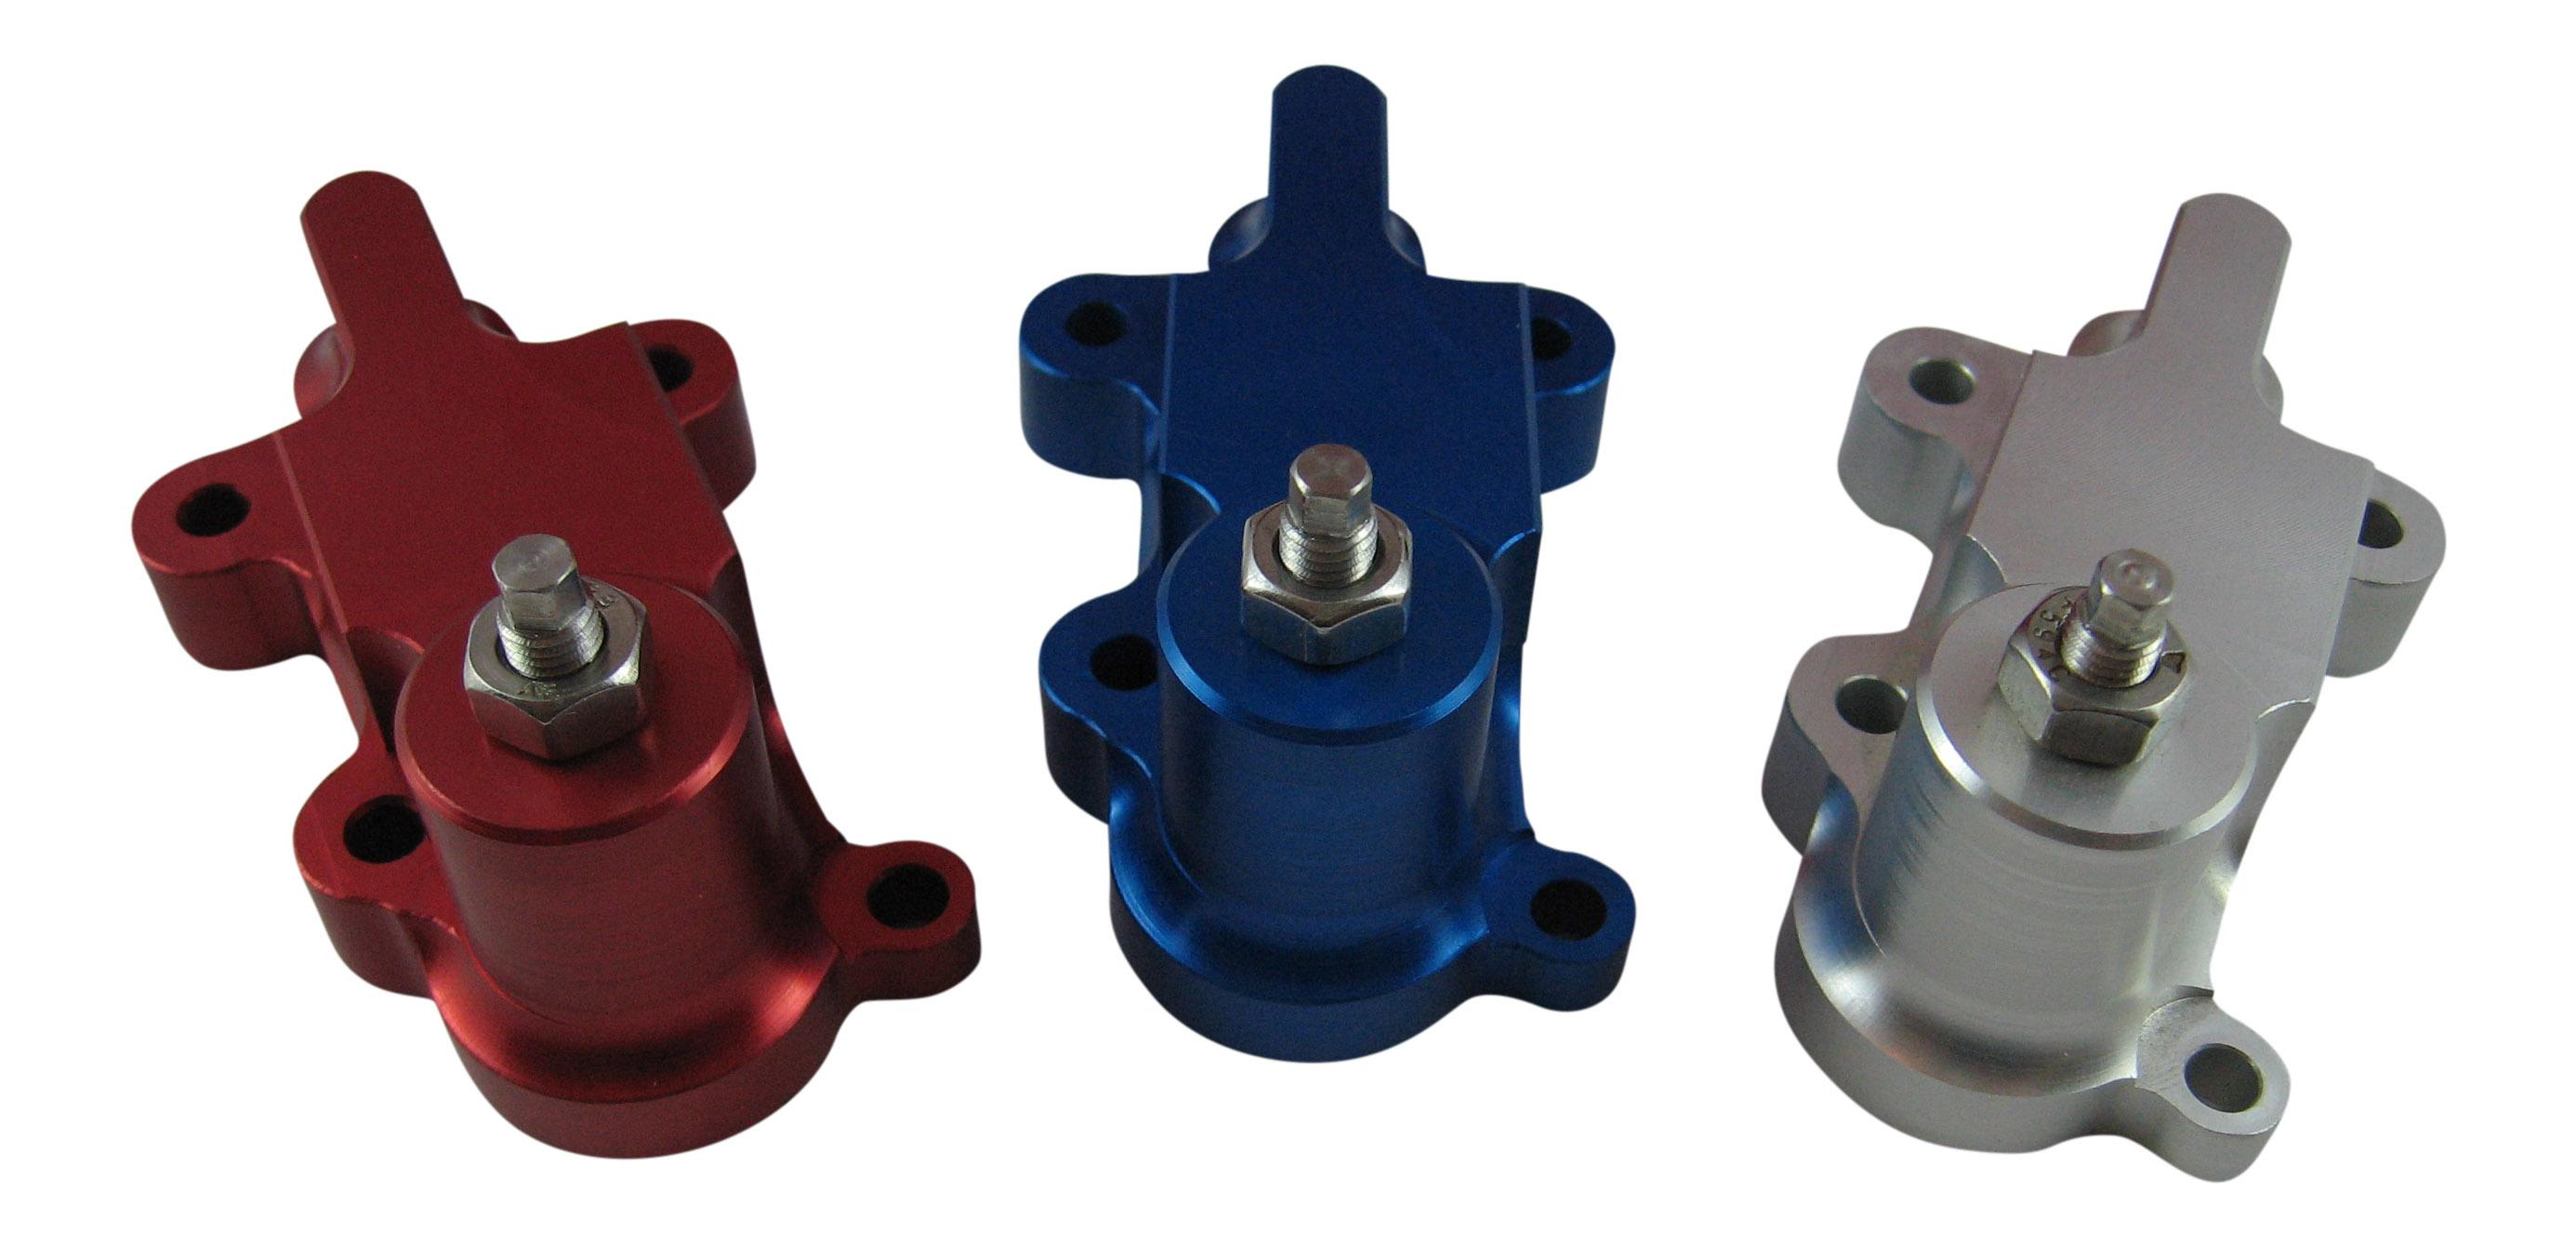 60 Powerstroke Fuel Pressure Regulator Housing Accurate Dieselrhaccuratediesel: Fuel Filter Cap O Ring For 6 0 Powerstroke At Gmaili.net